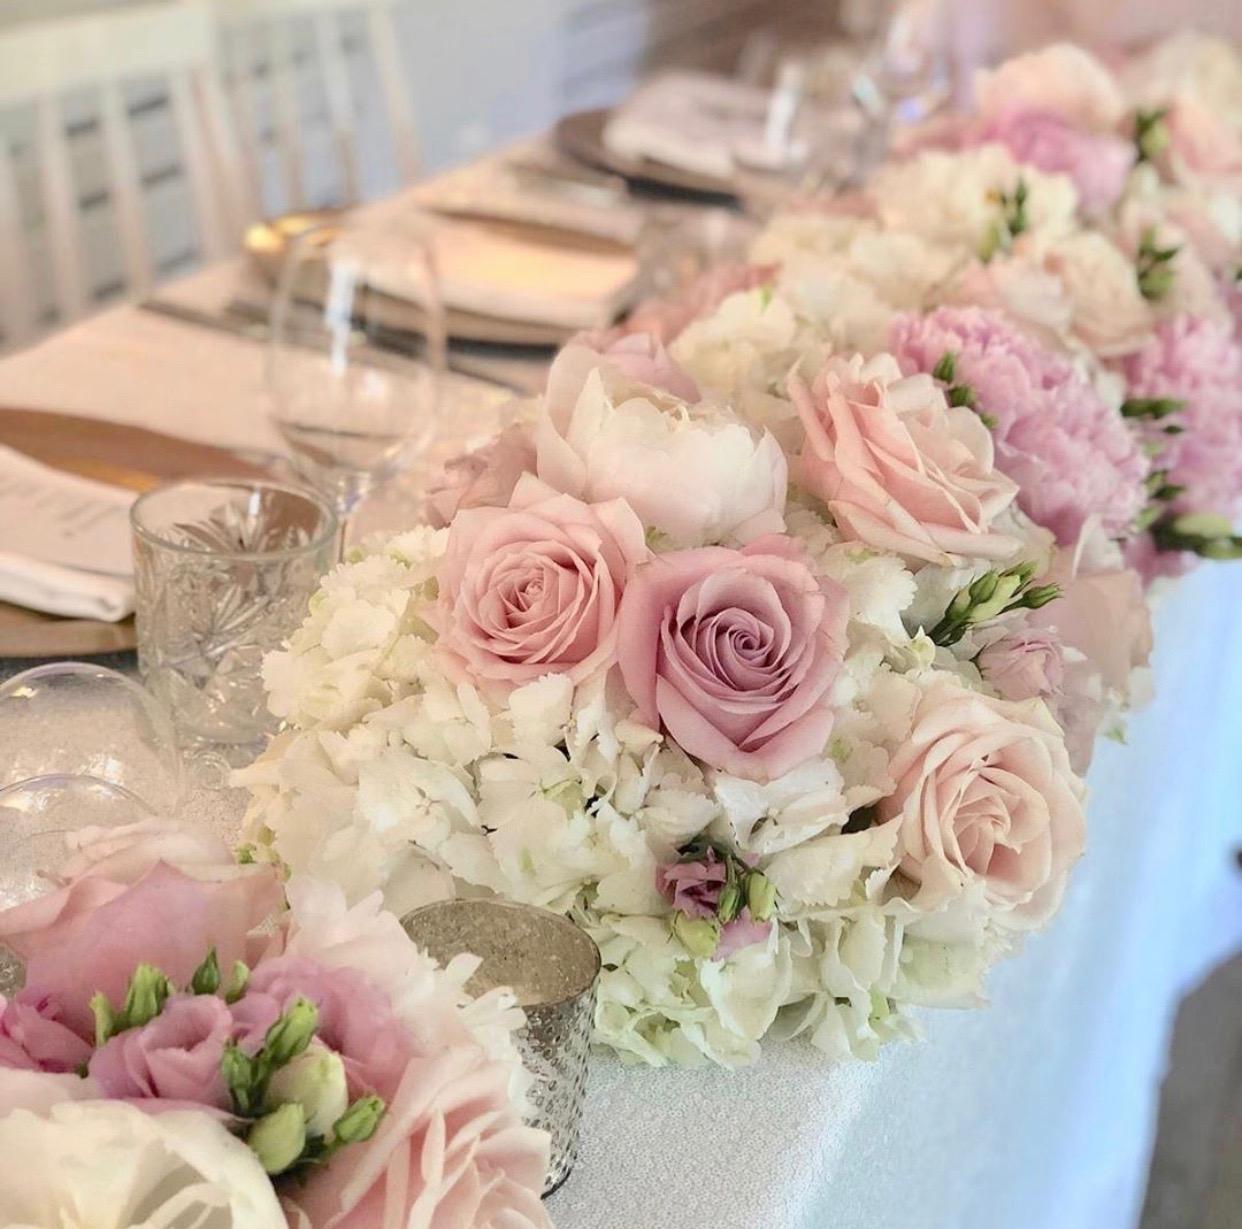 cvetni venac od ruza i hortenzija za dekoraciju mladenackog stola